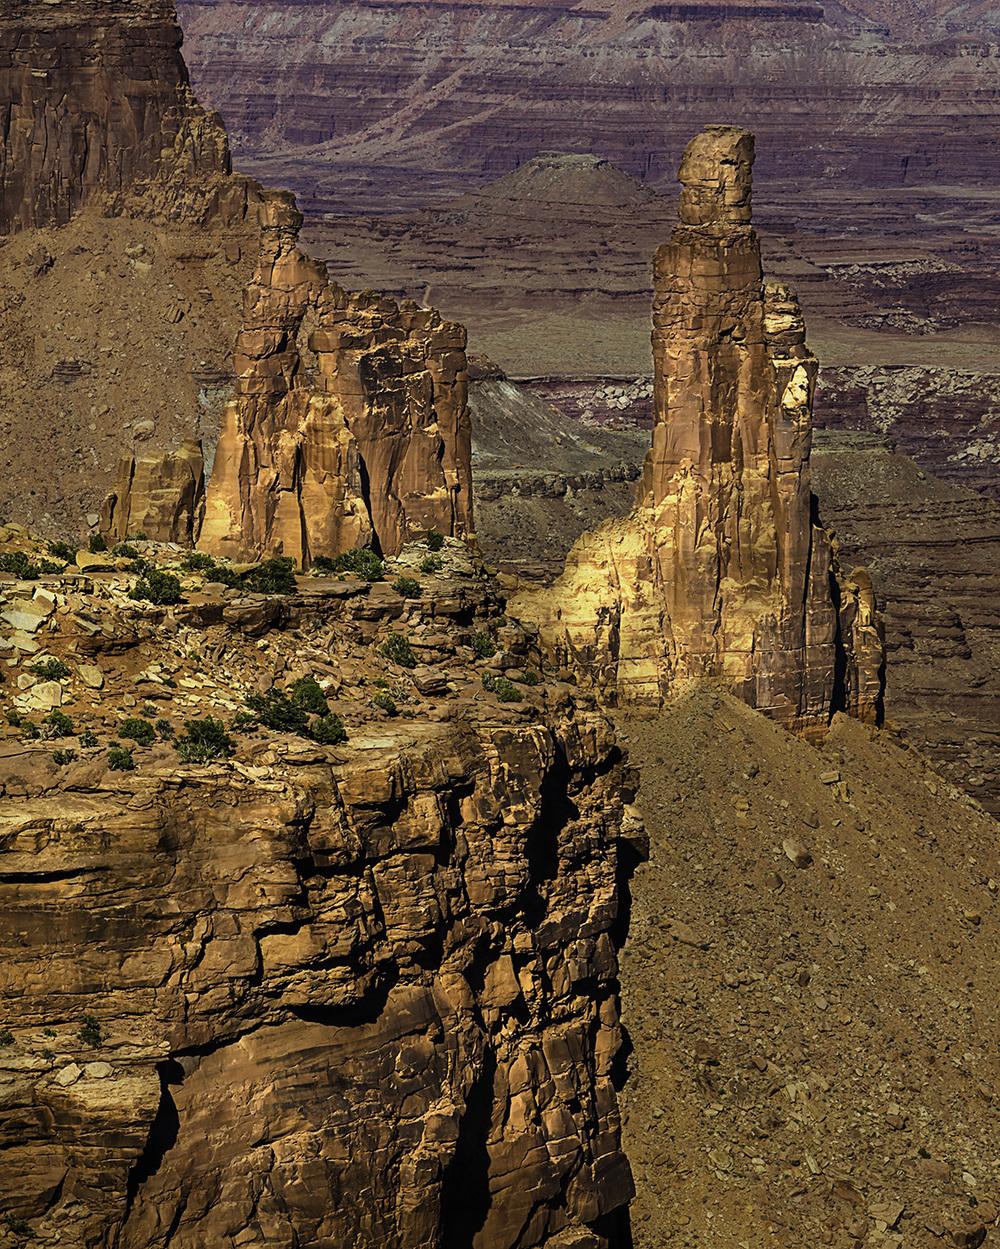 Washer Woman Arch, Canyonlands National Park, near Moab, Utah